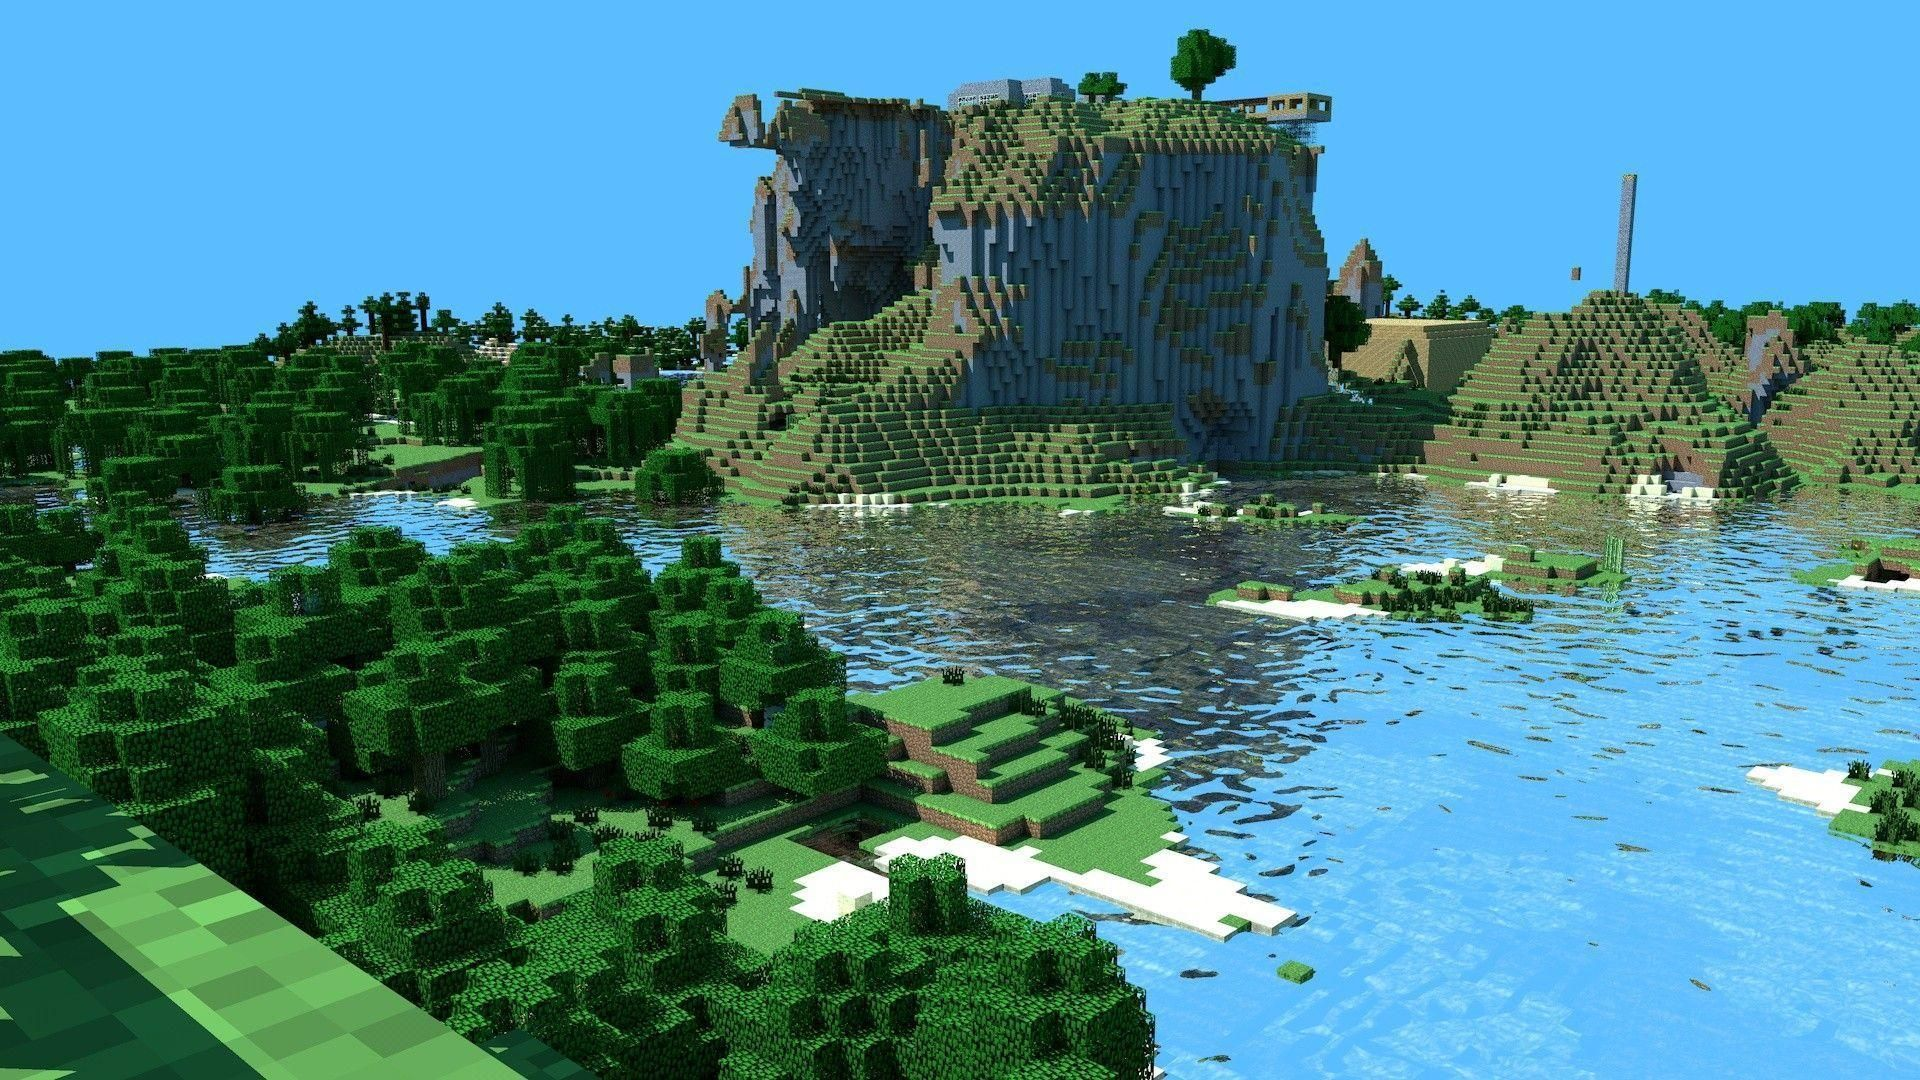 Minecraft Backgrounds Hd Minecraft Wallpaper Minecraft Pictures Minecraft Shaders